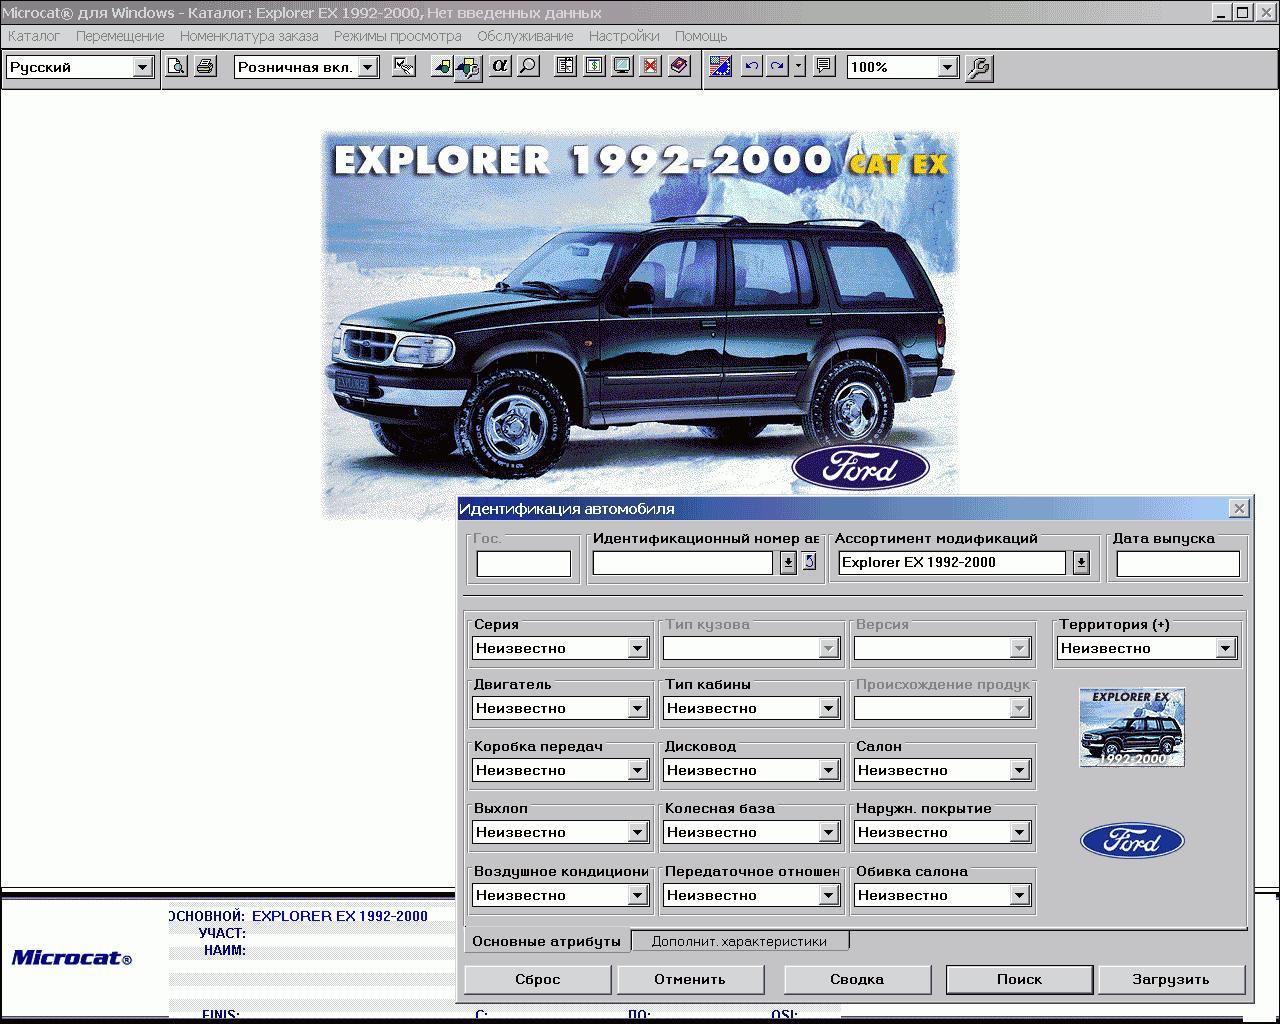 Ford explorer iii каталог запчастей